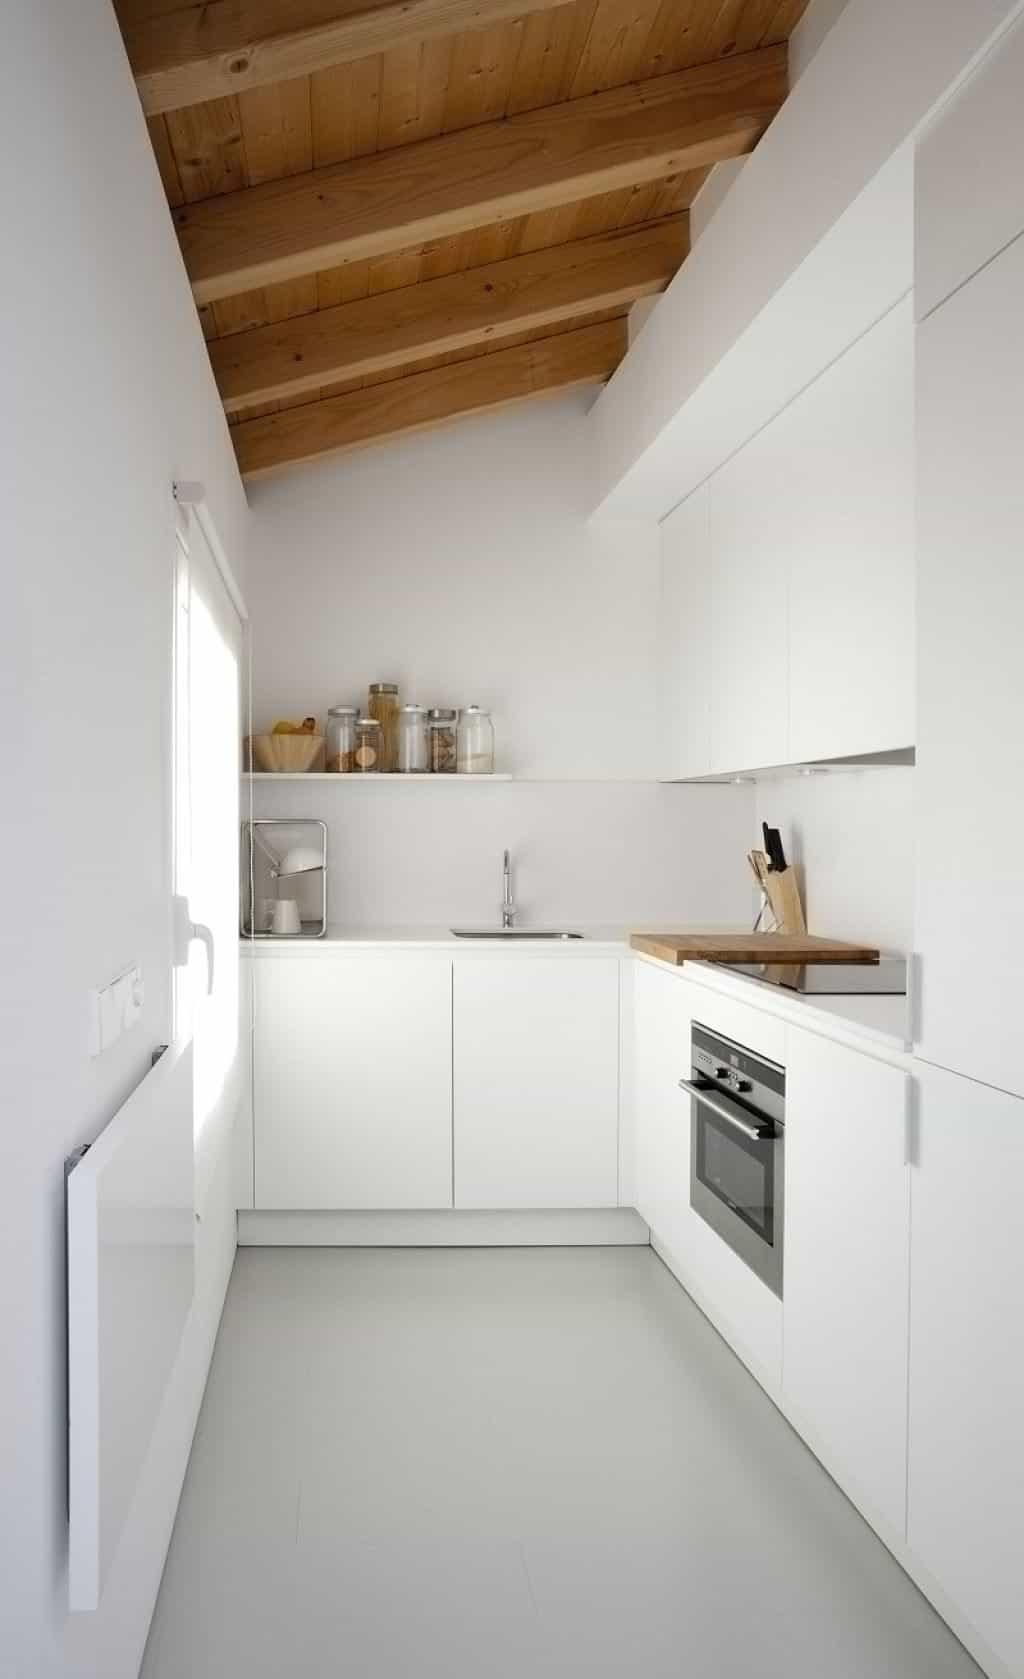 small-minimalist-kitchen-with-white-walls